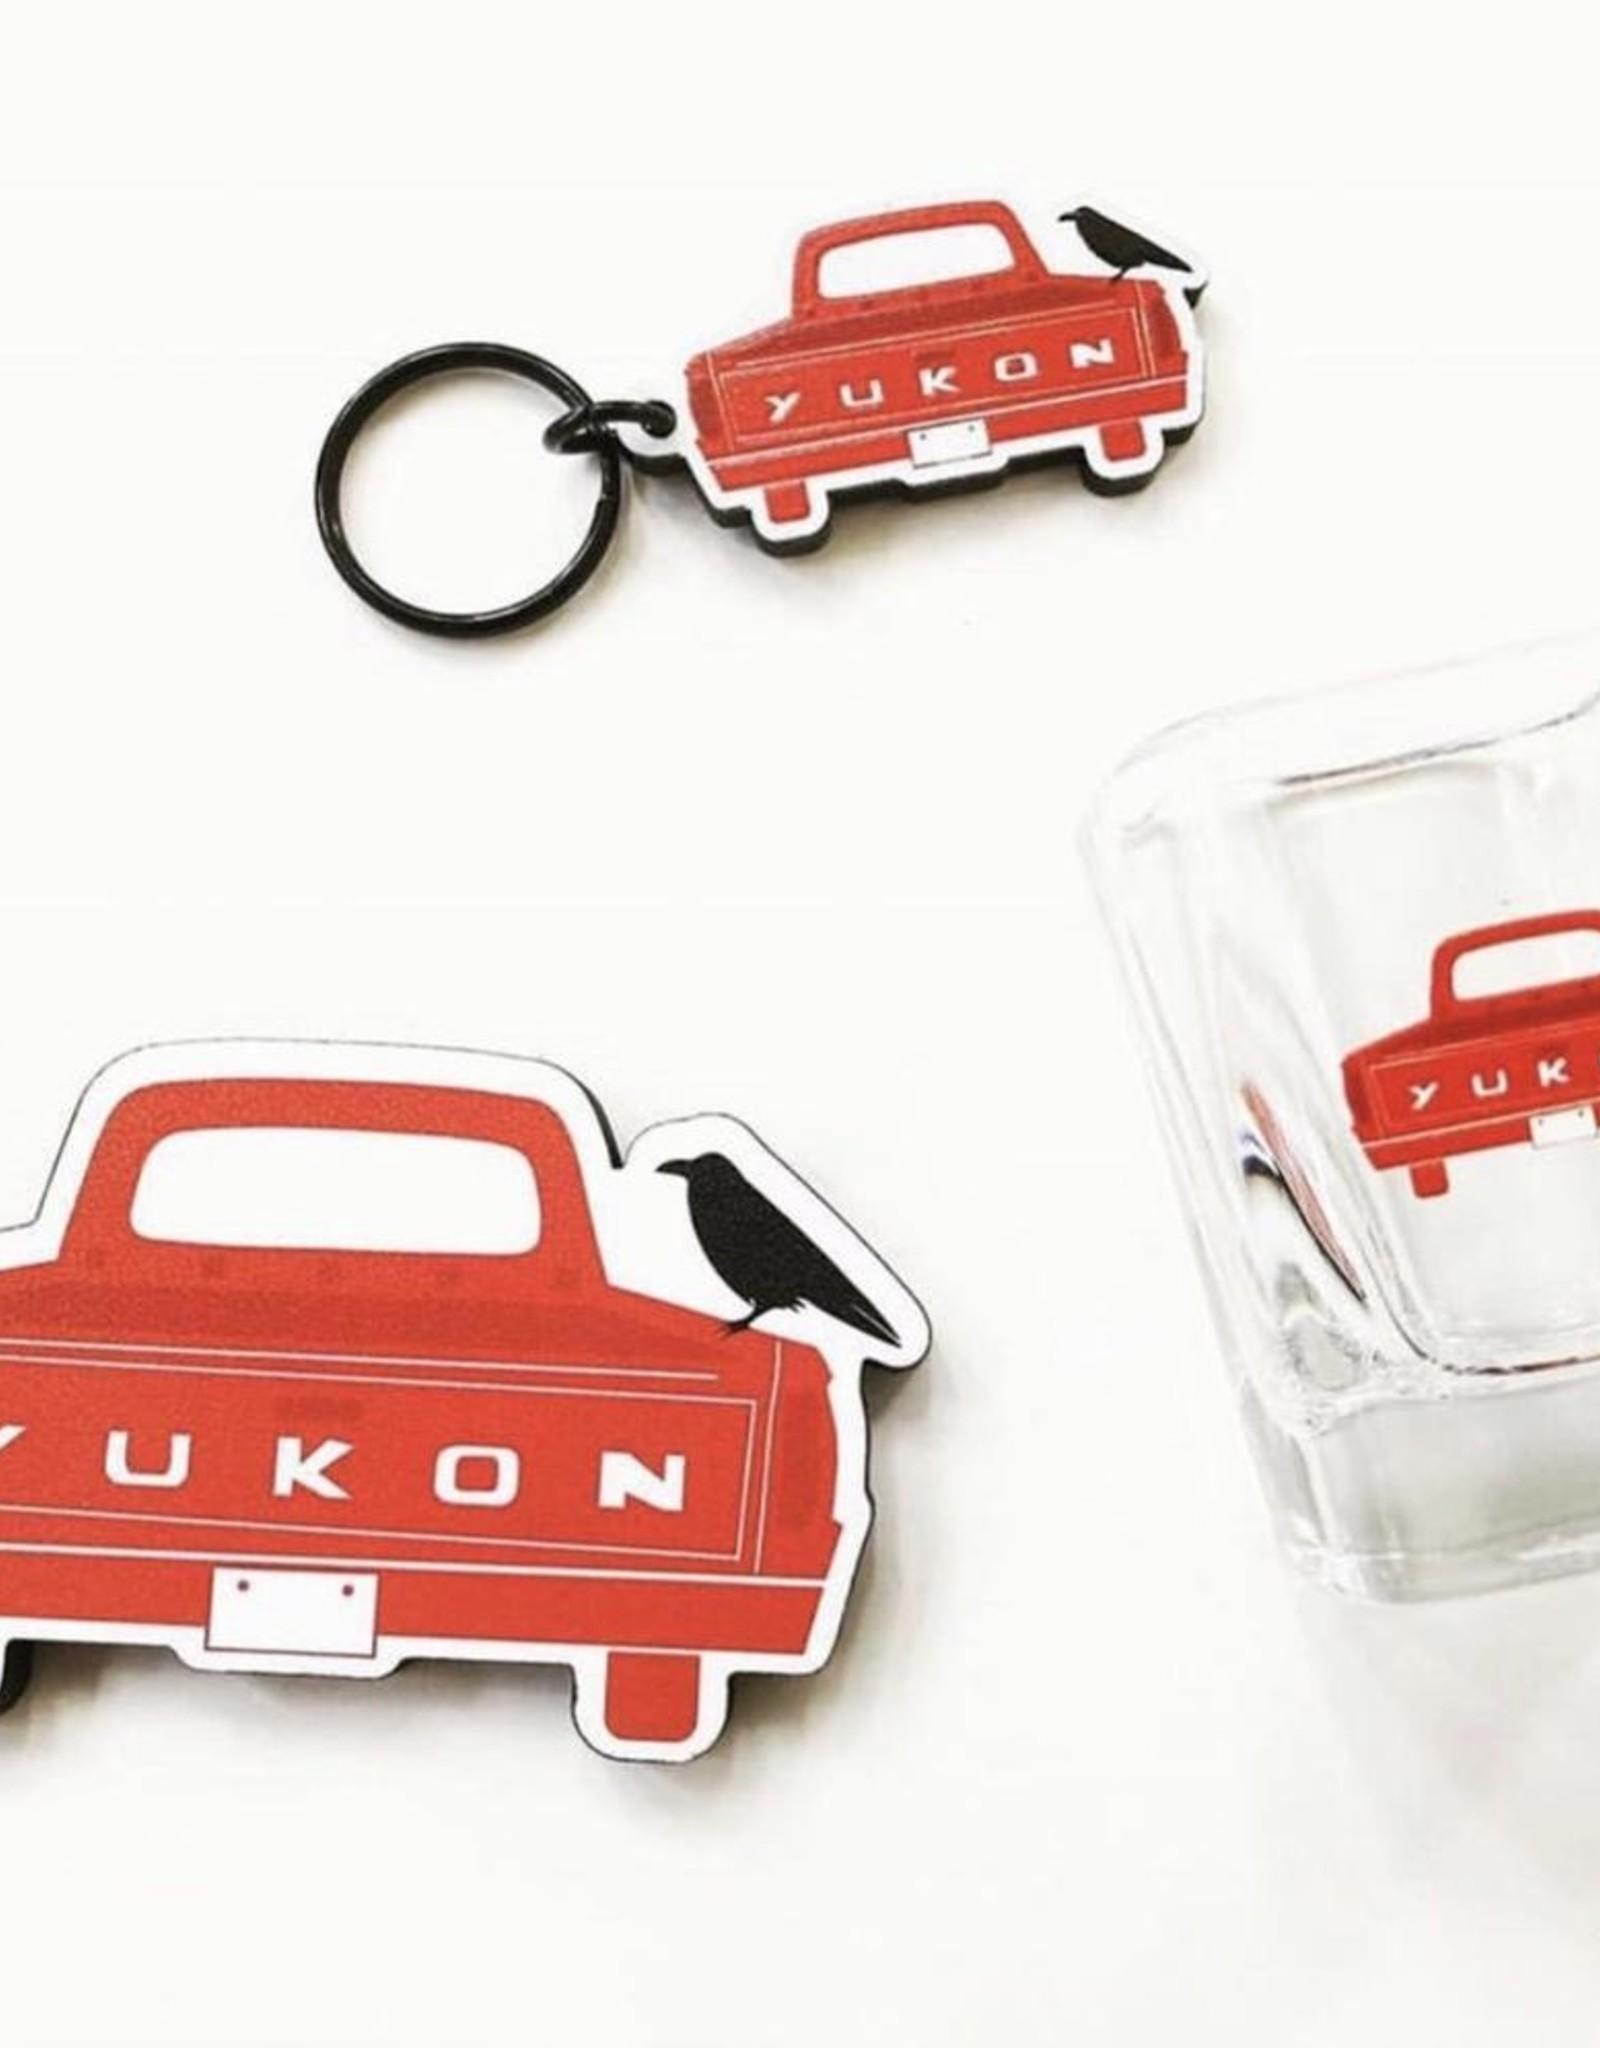 Yukon Truck Shot Glass